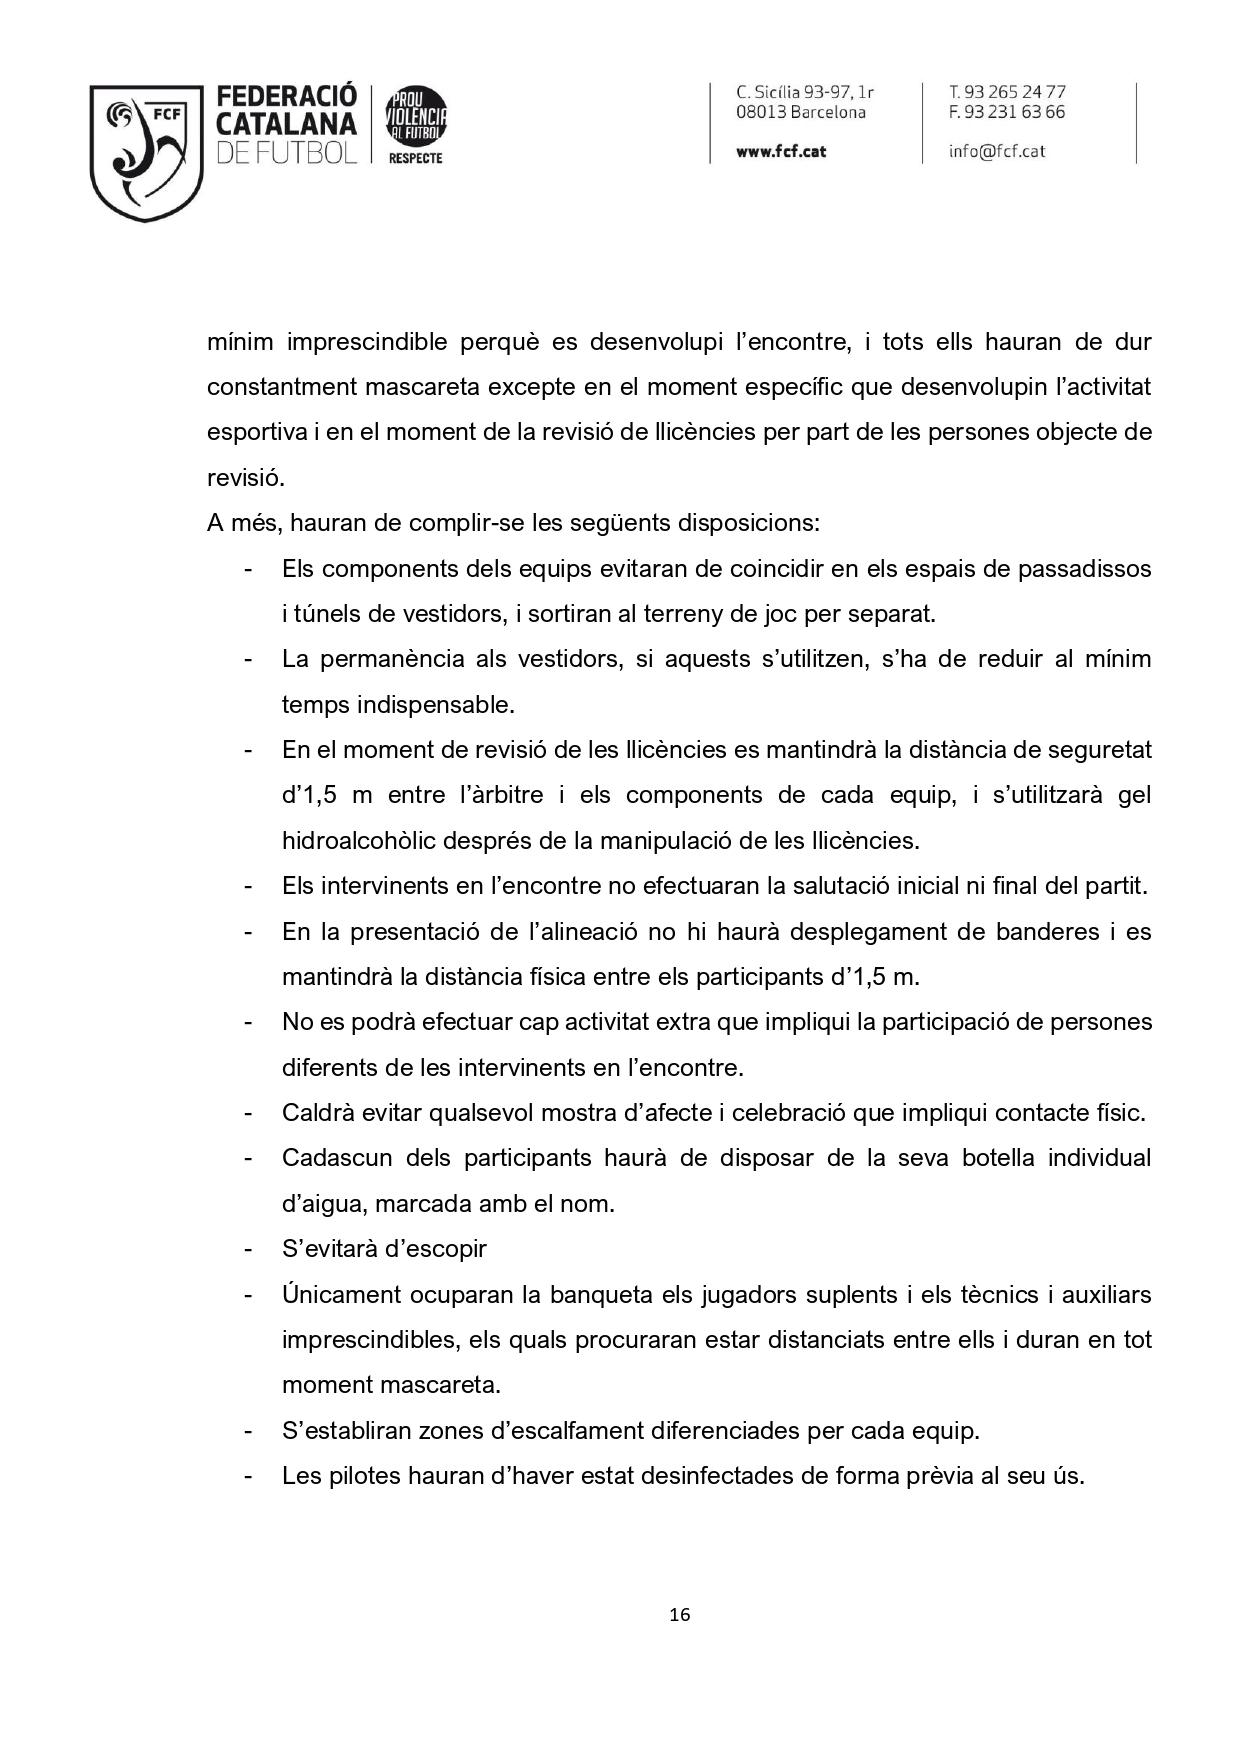 Circular Actualització Protocol Competicions _set21_2_page-0016